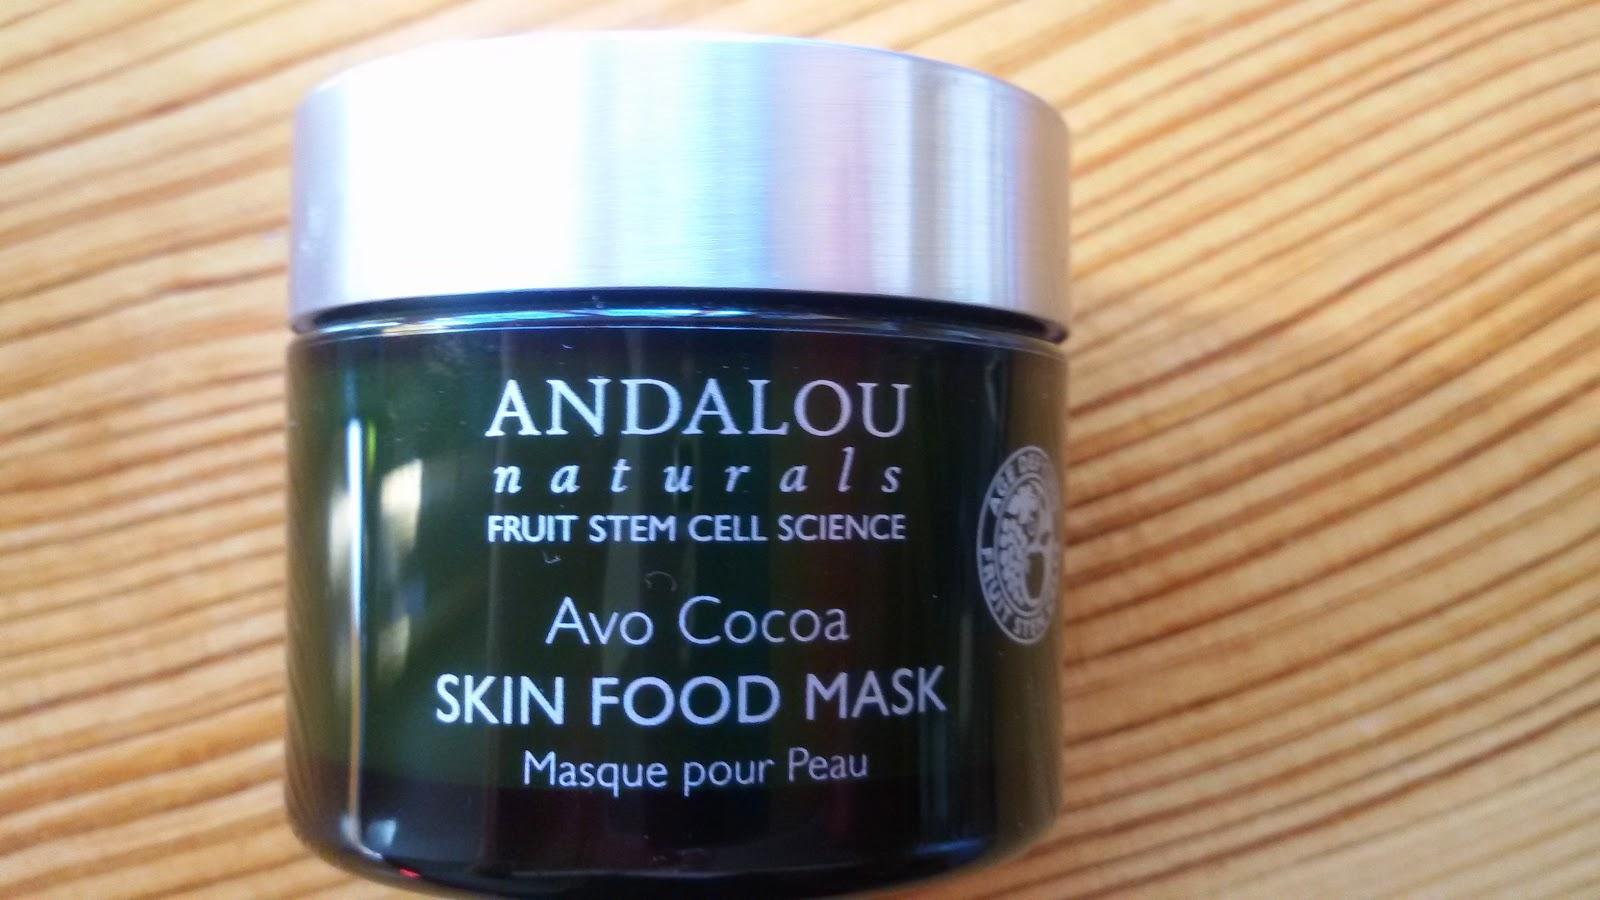 Andalou Naturals Avo Cocoa Skinfood Mask